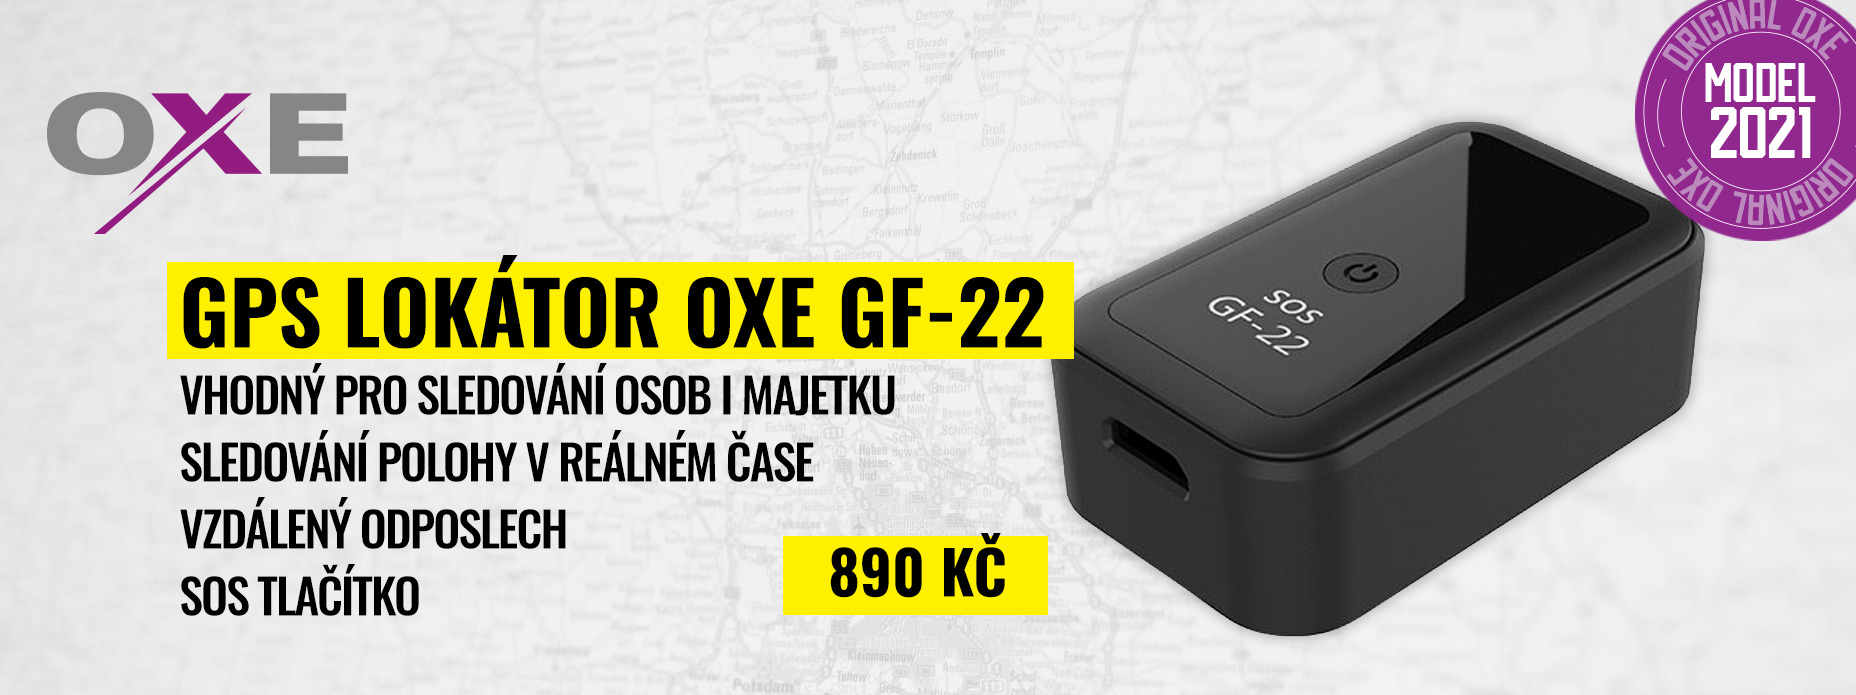 OXE GF-22 - GPS lokátor